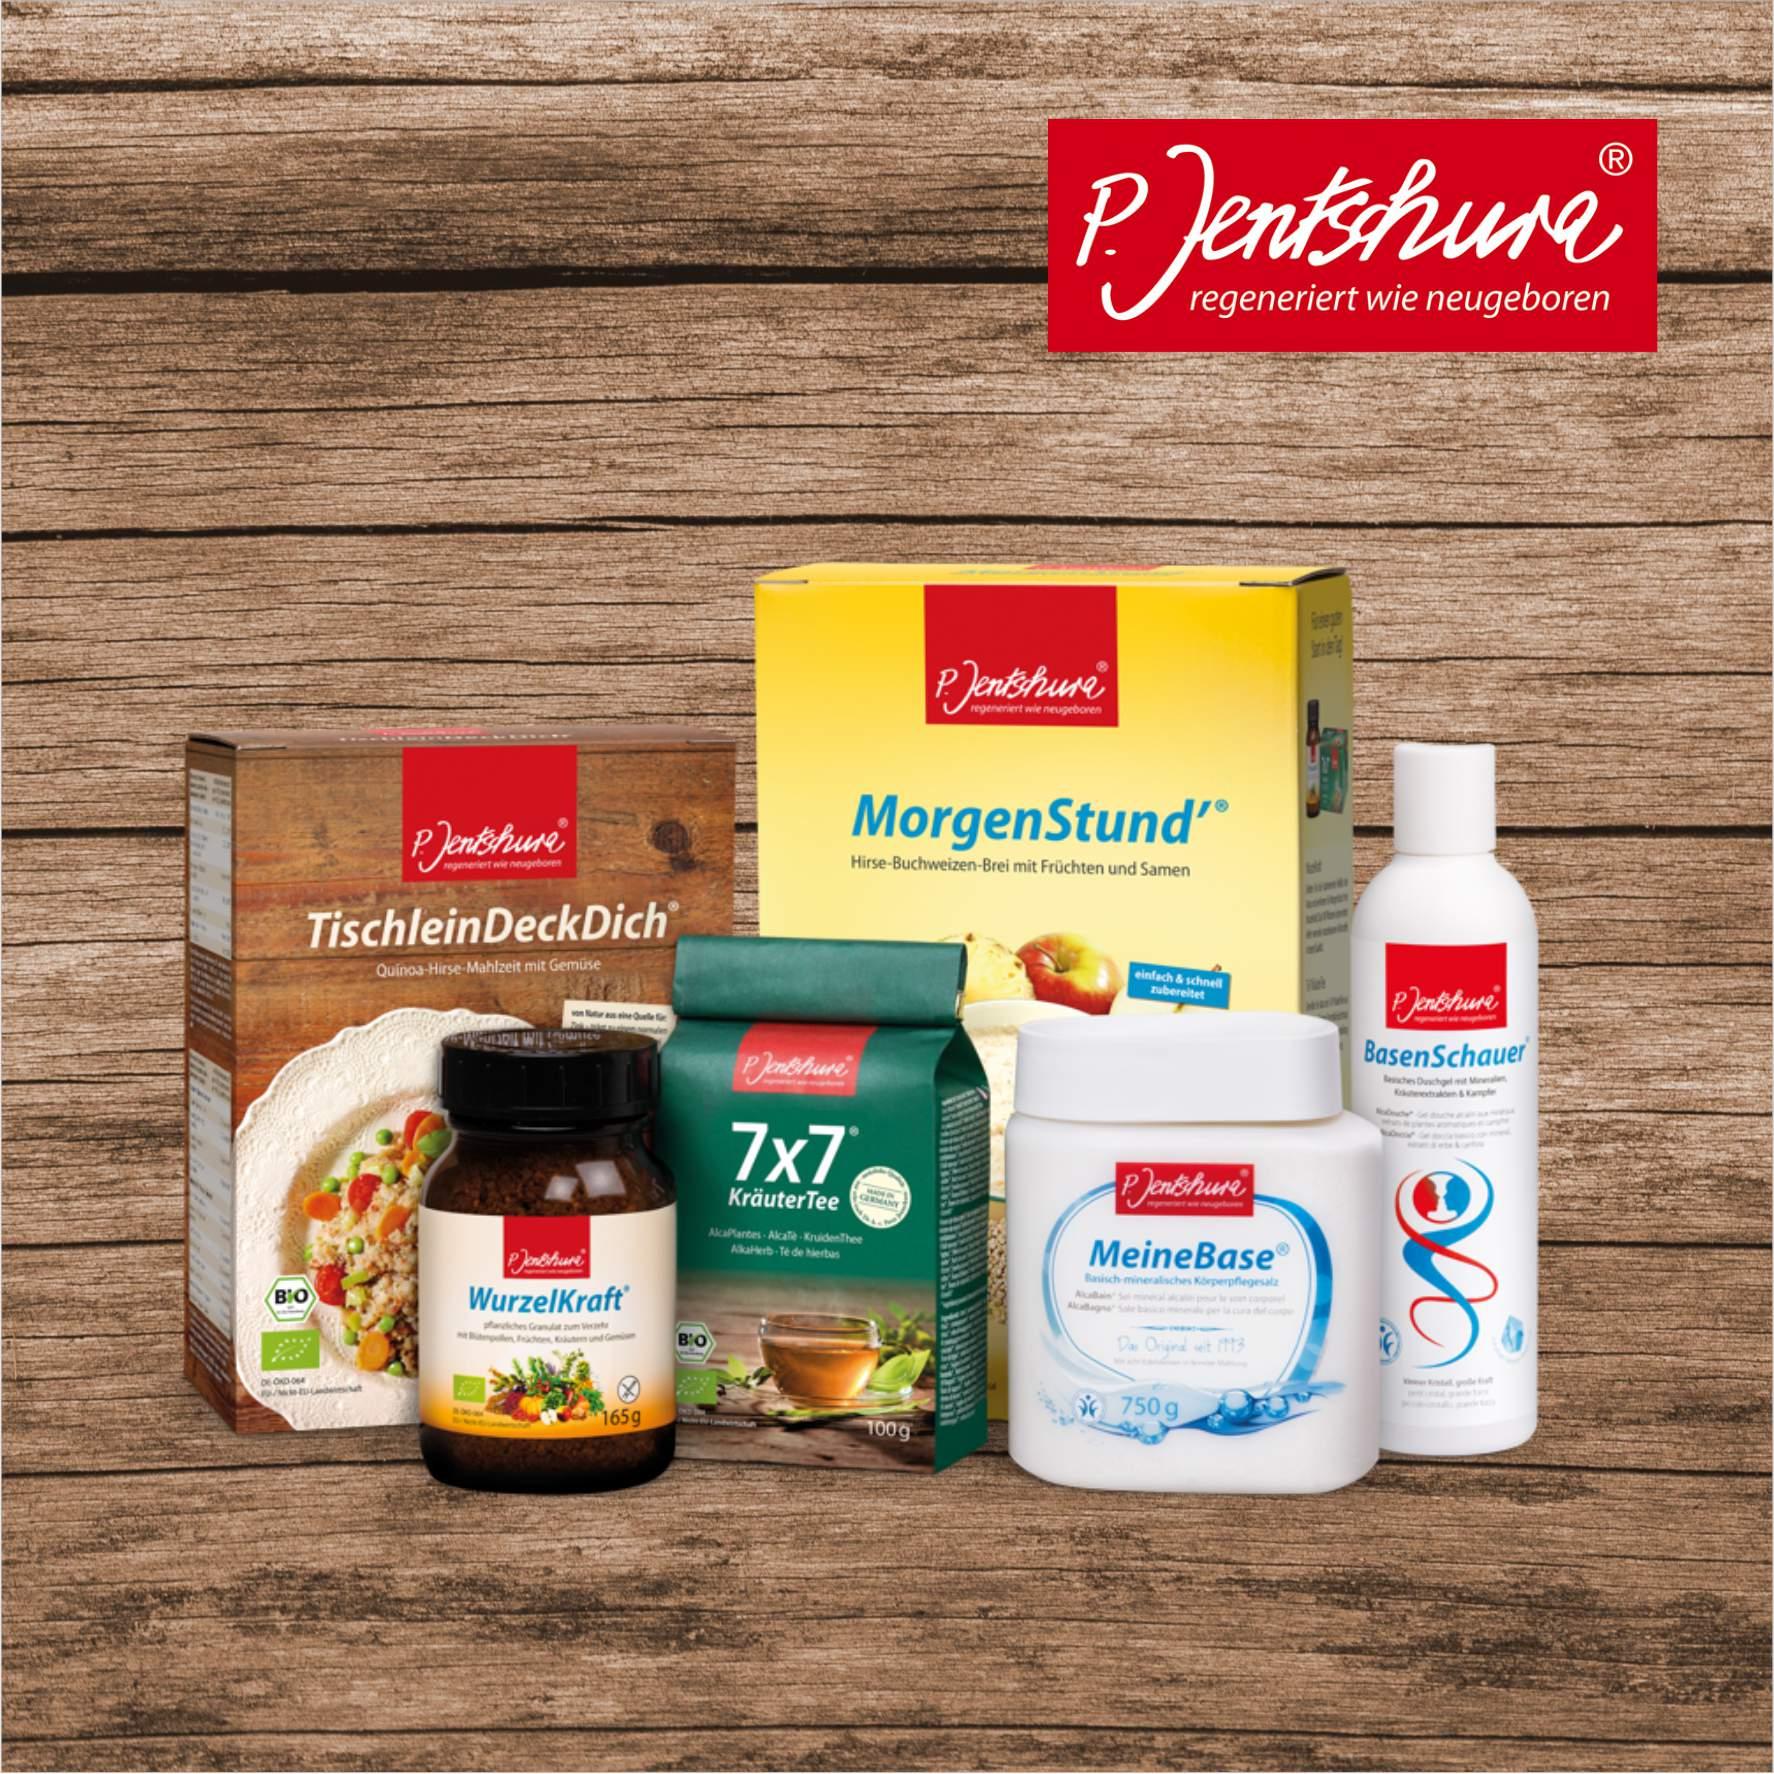 Jentschura Produkte